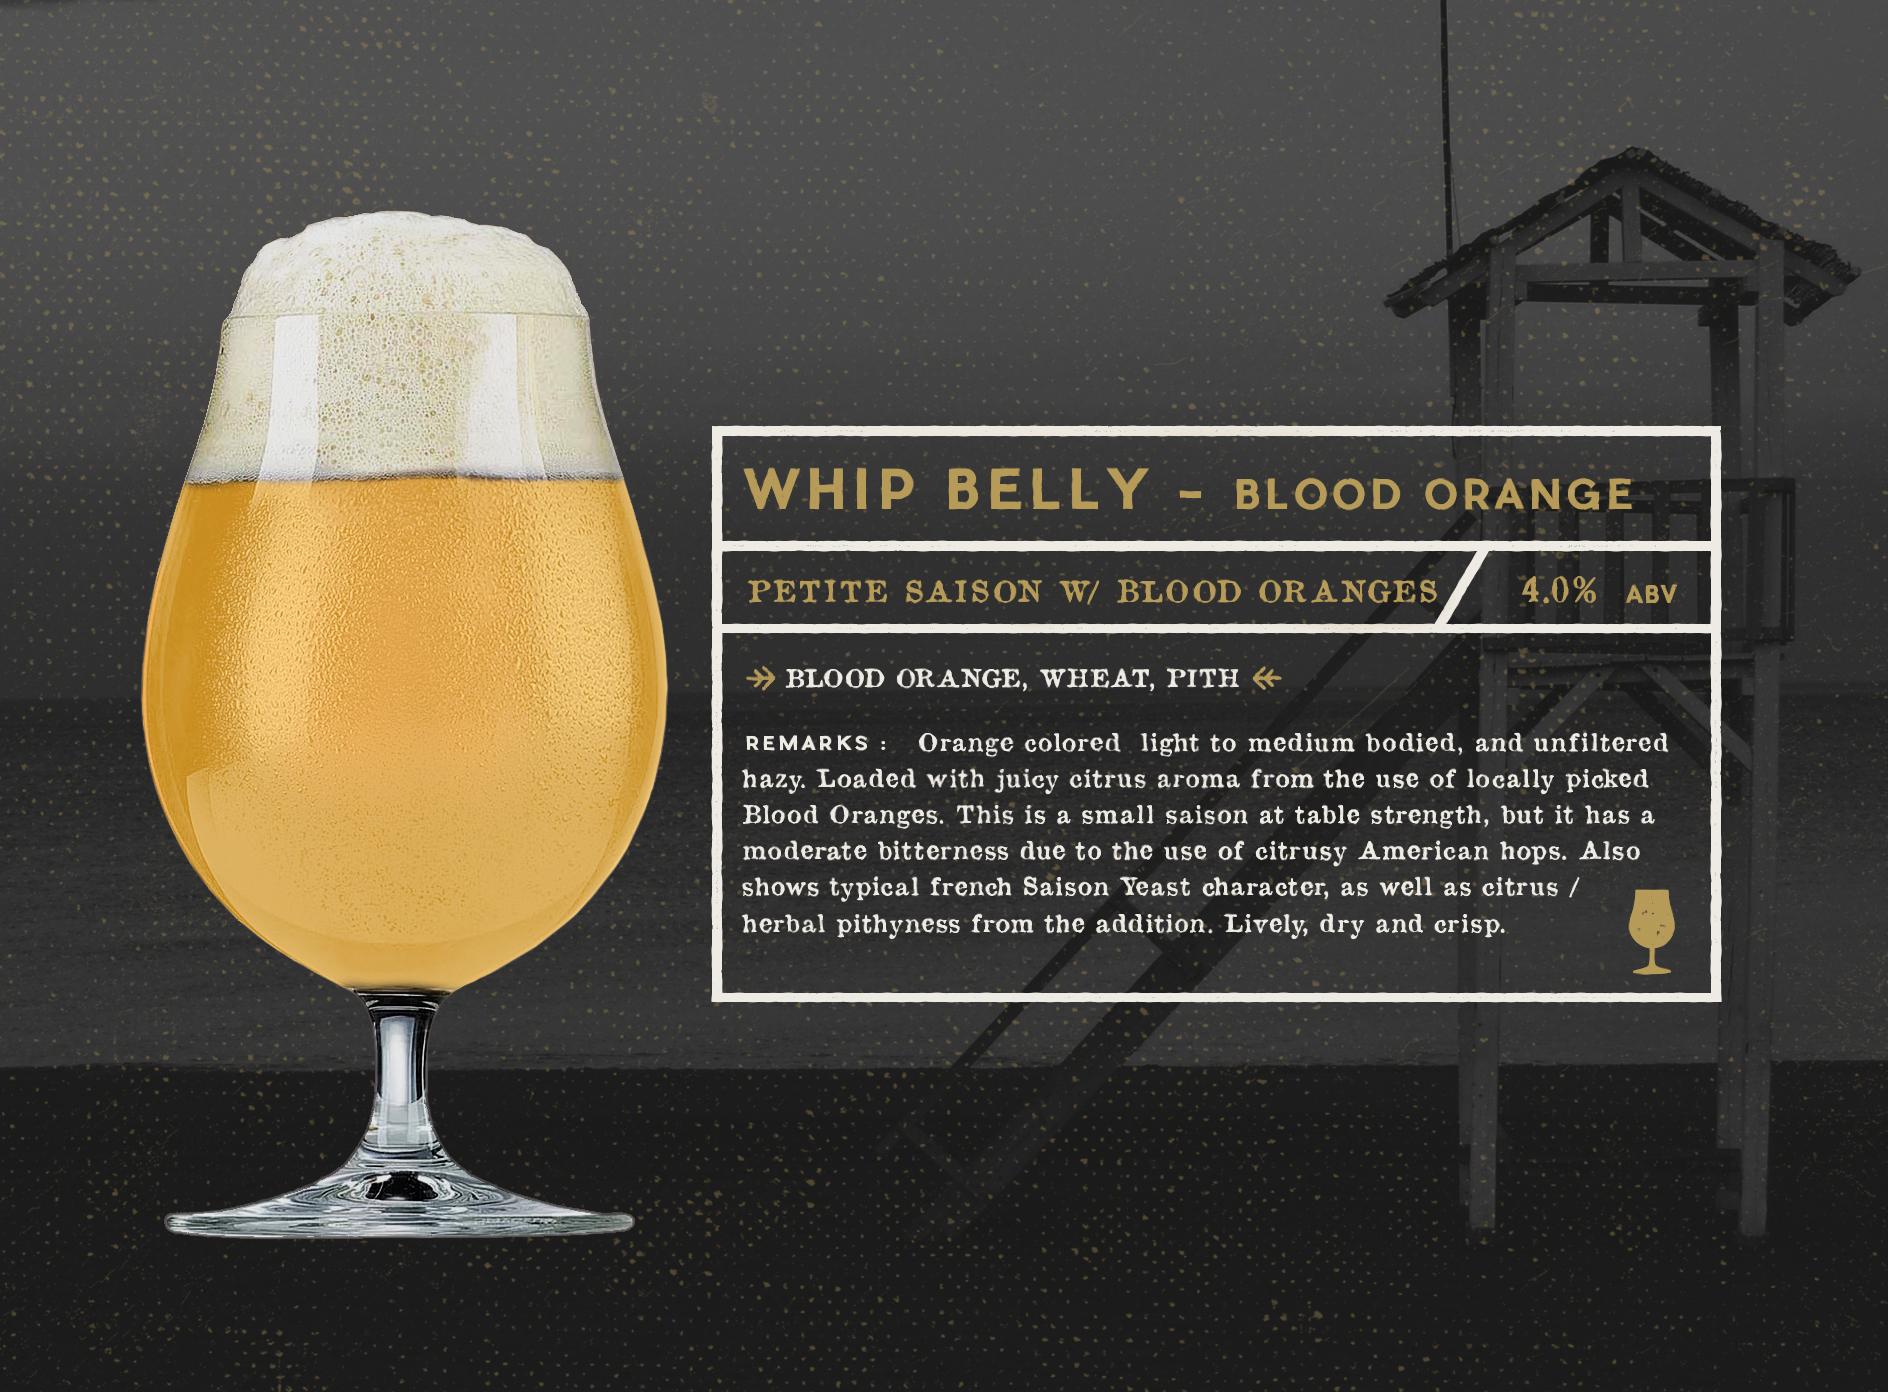 WHIP BELLY - BLOOD ORANGE